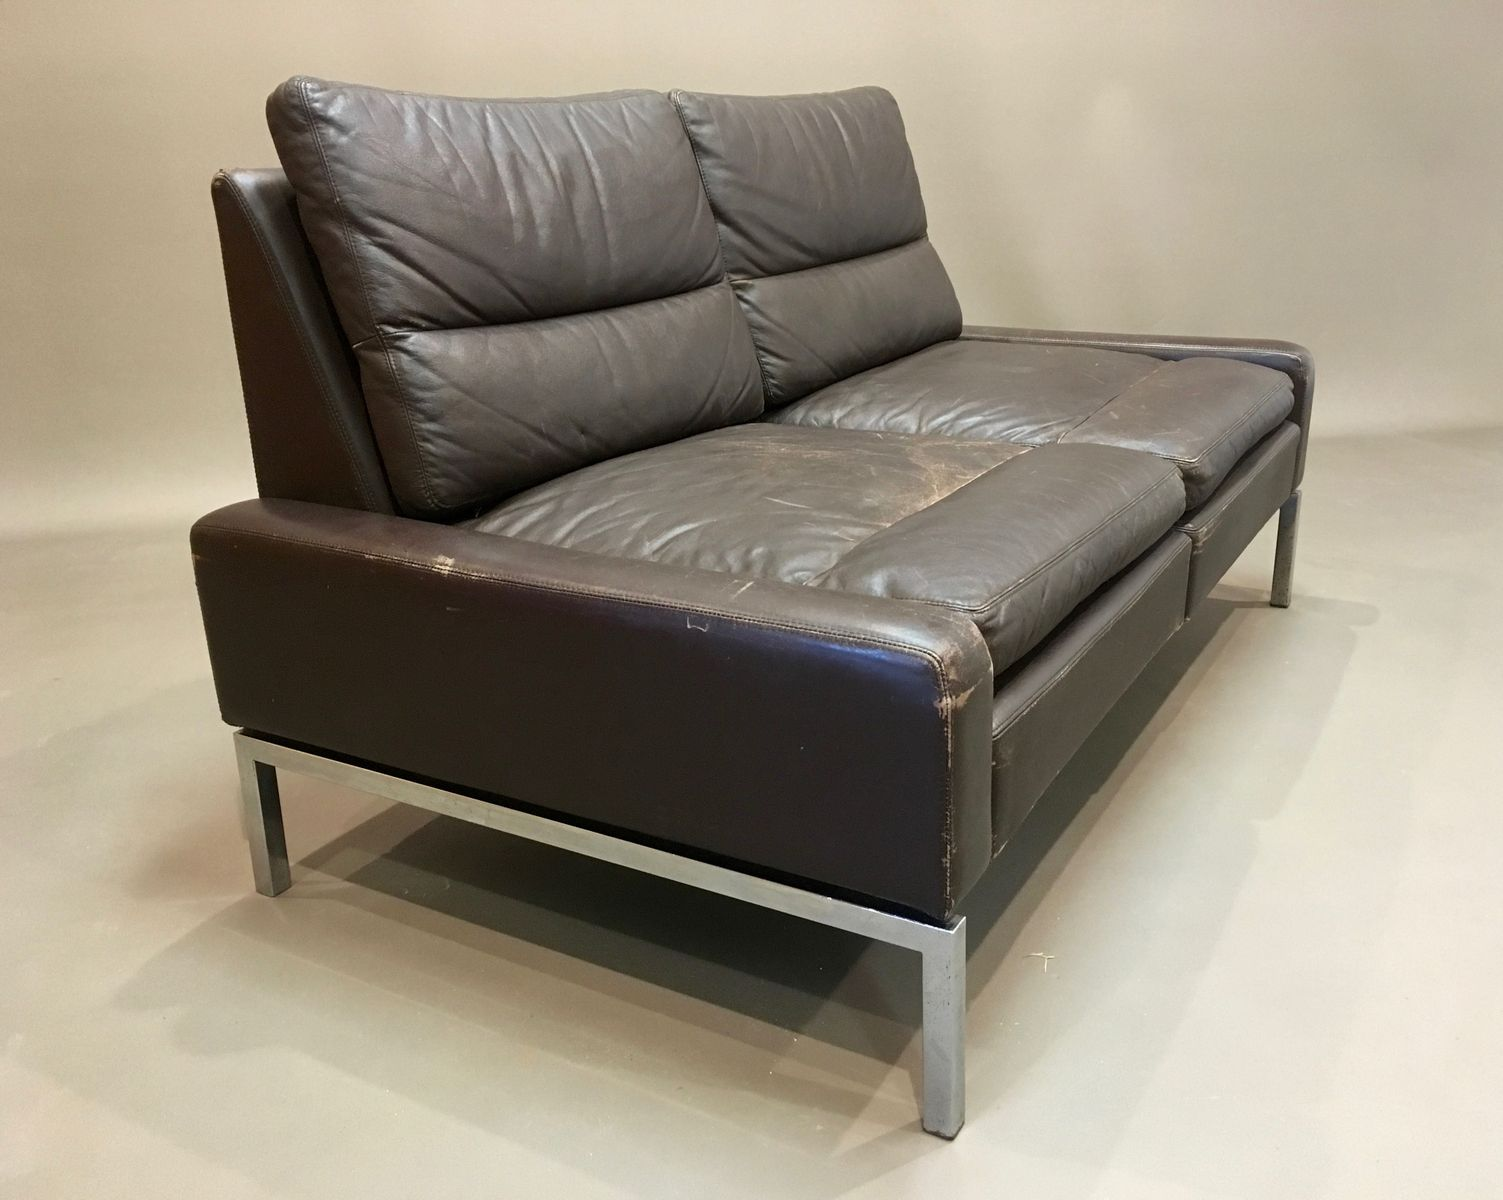 Sofa Deutschland Kaufen. bullfrog sofa. bullfrog sofas germany. ikea couch mit top with ikea ...